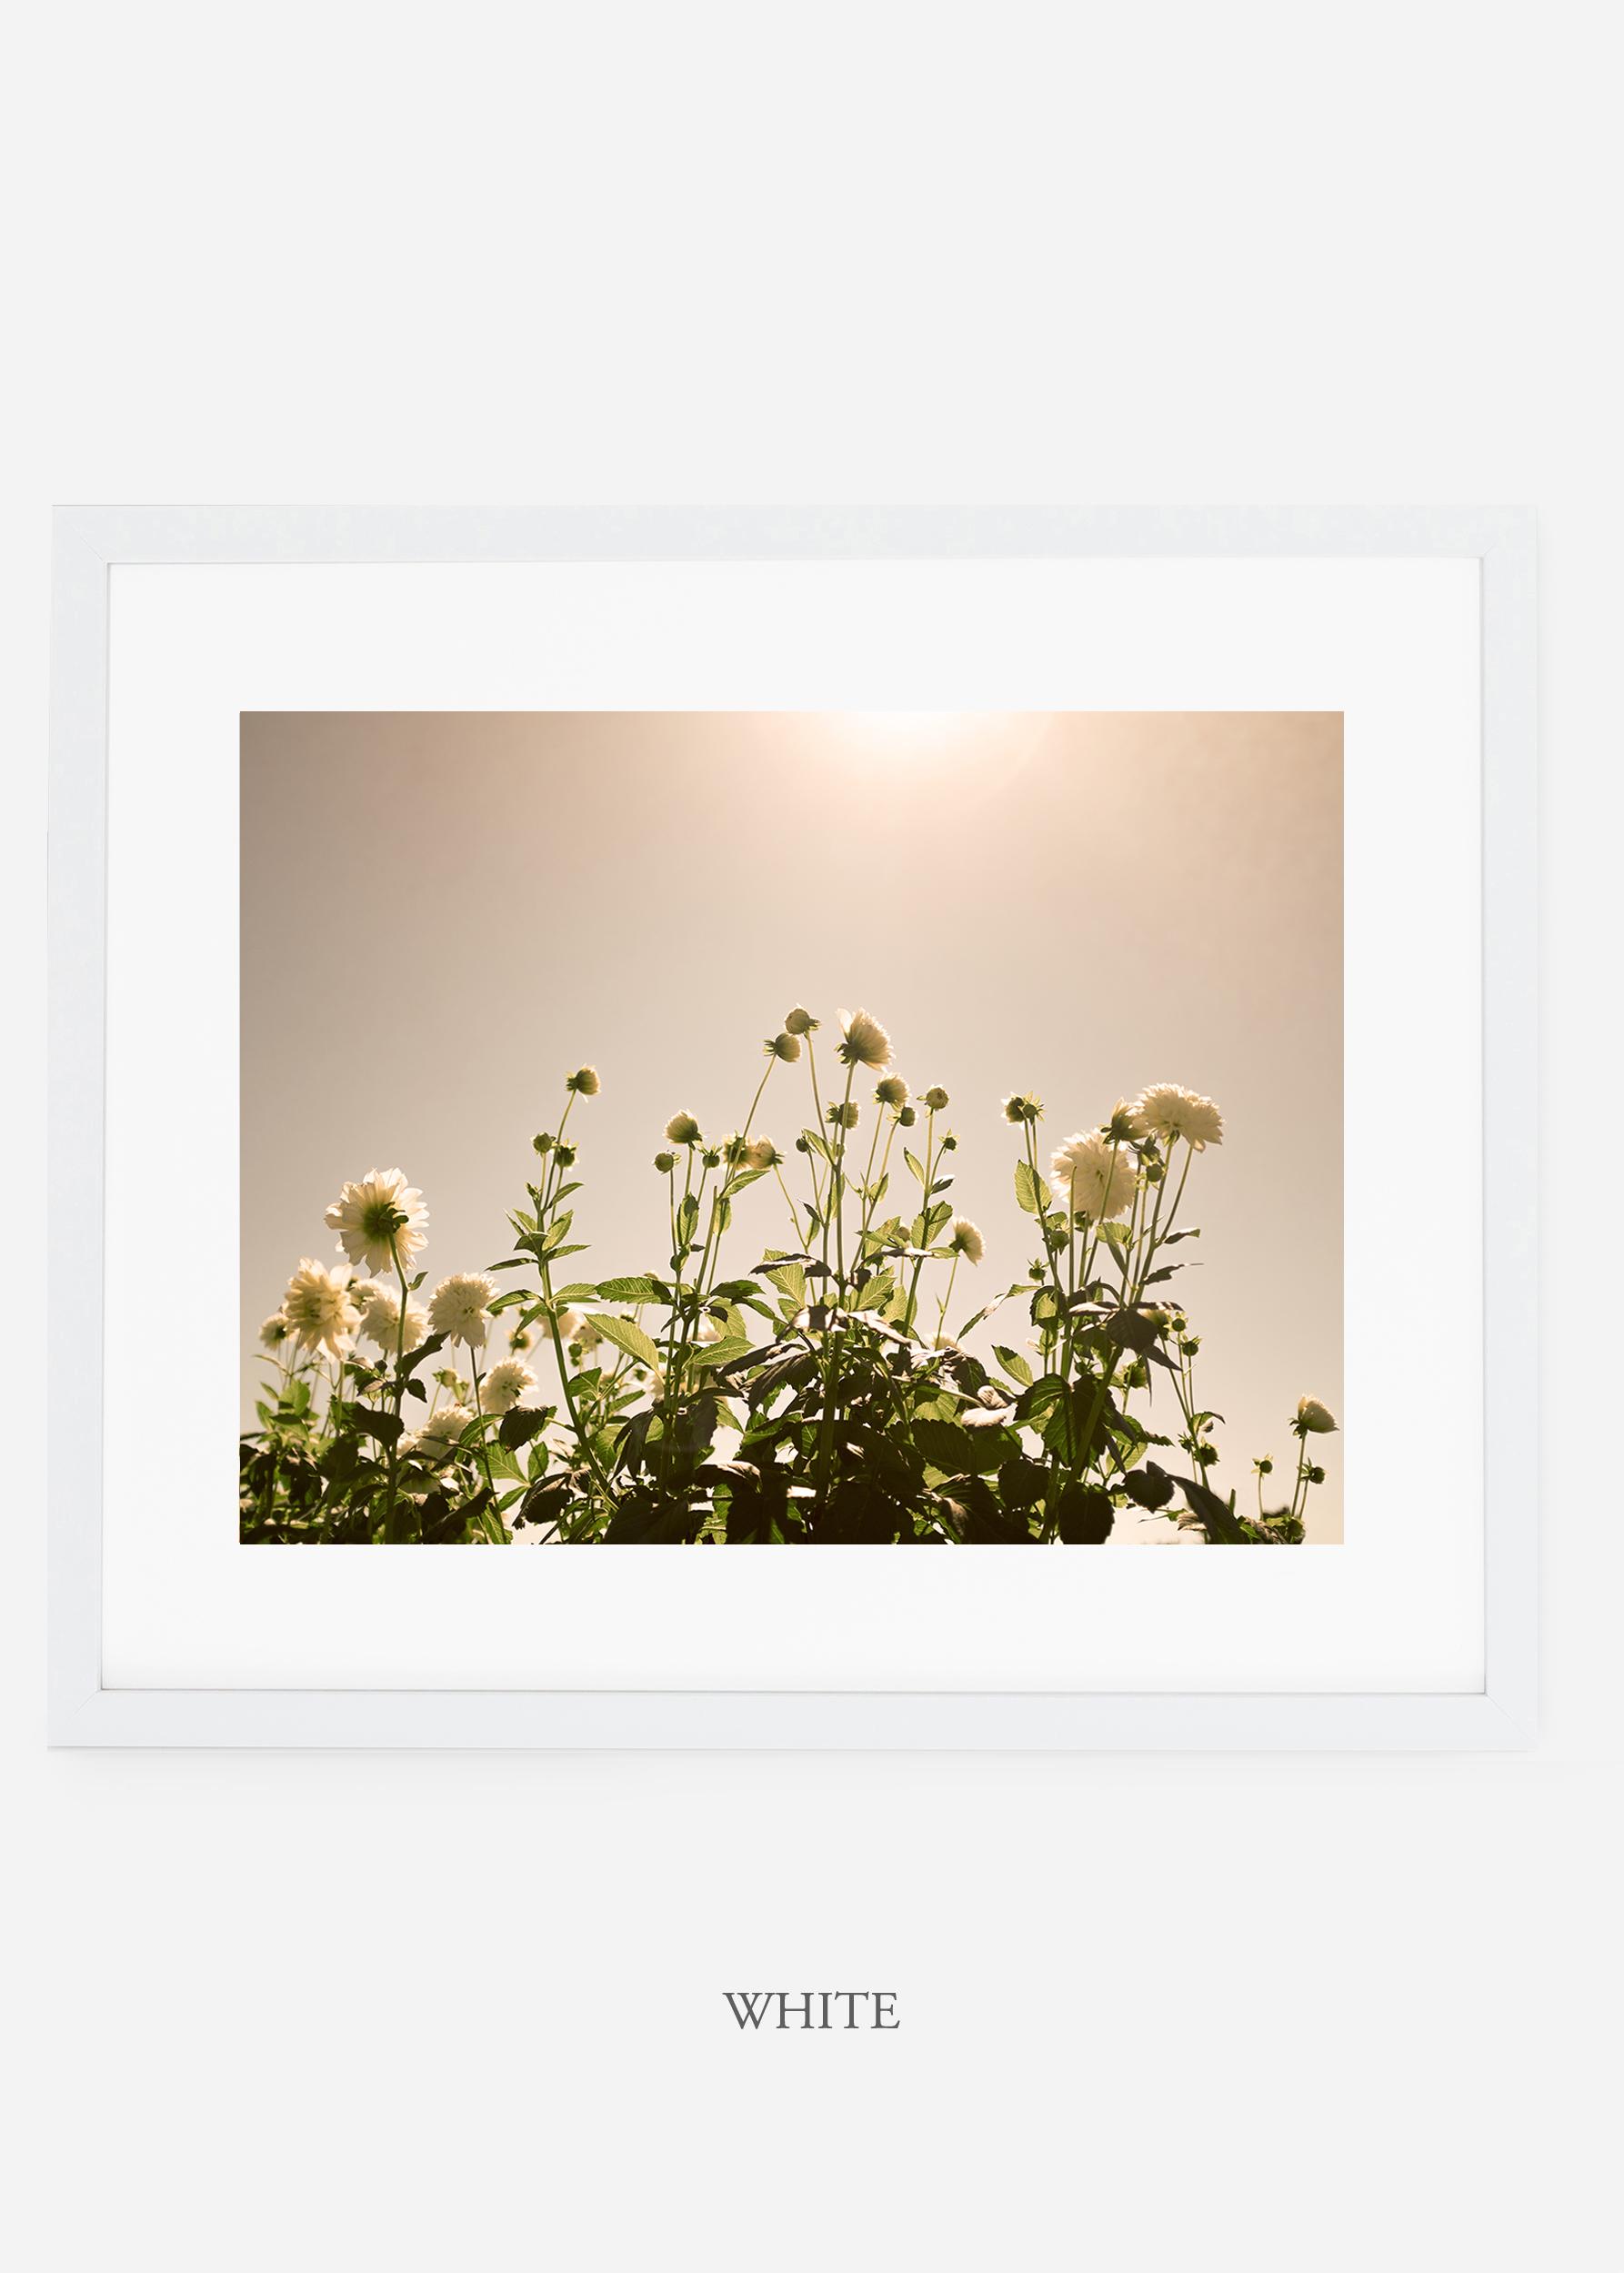 wilder-california-whiteframe-dahlia-7-minimal-botanical-print-art-interior-design.jpg